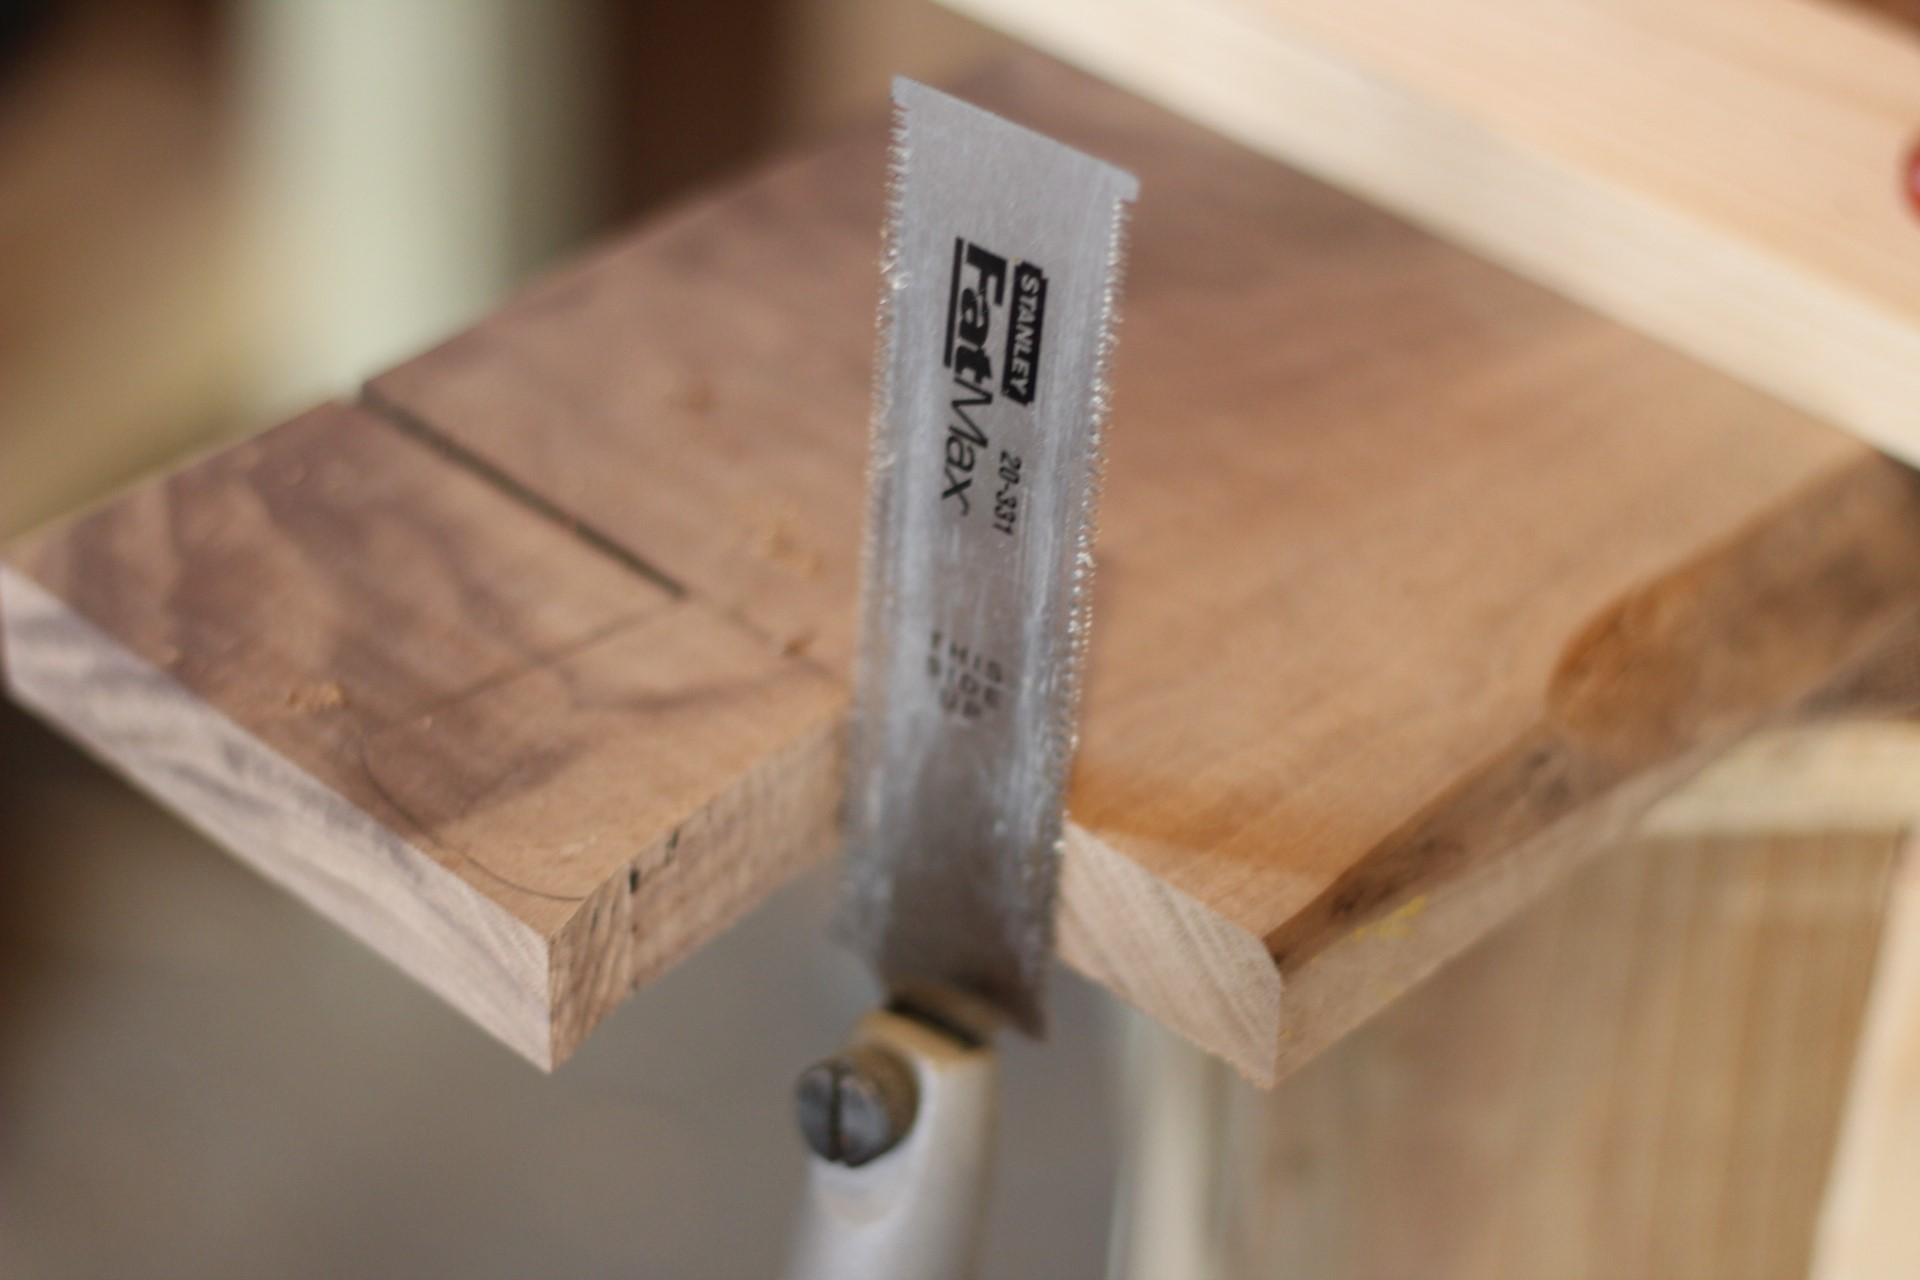 Flat saw